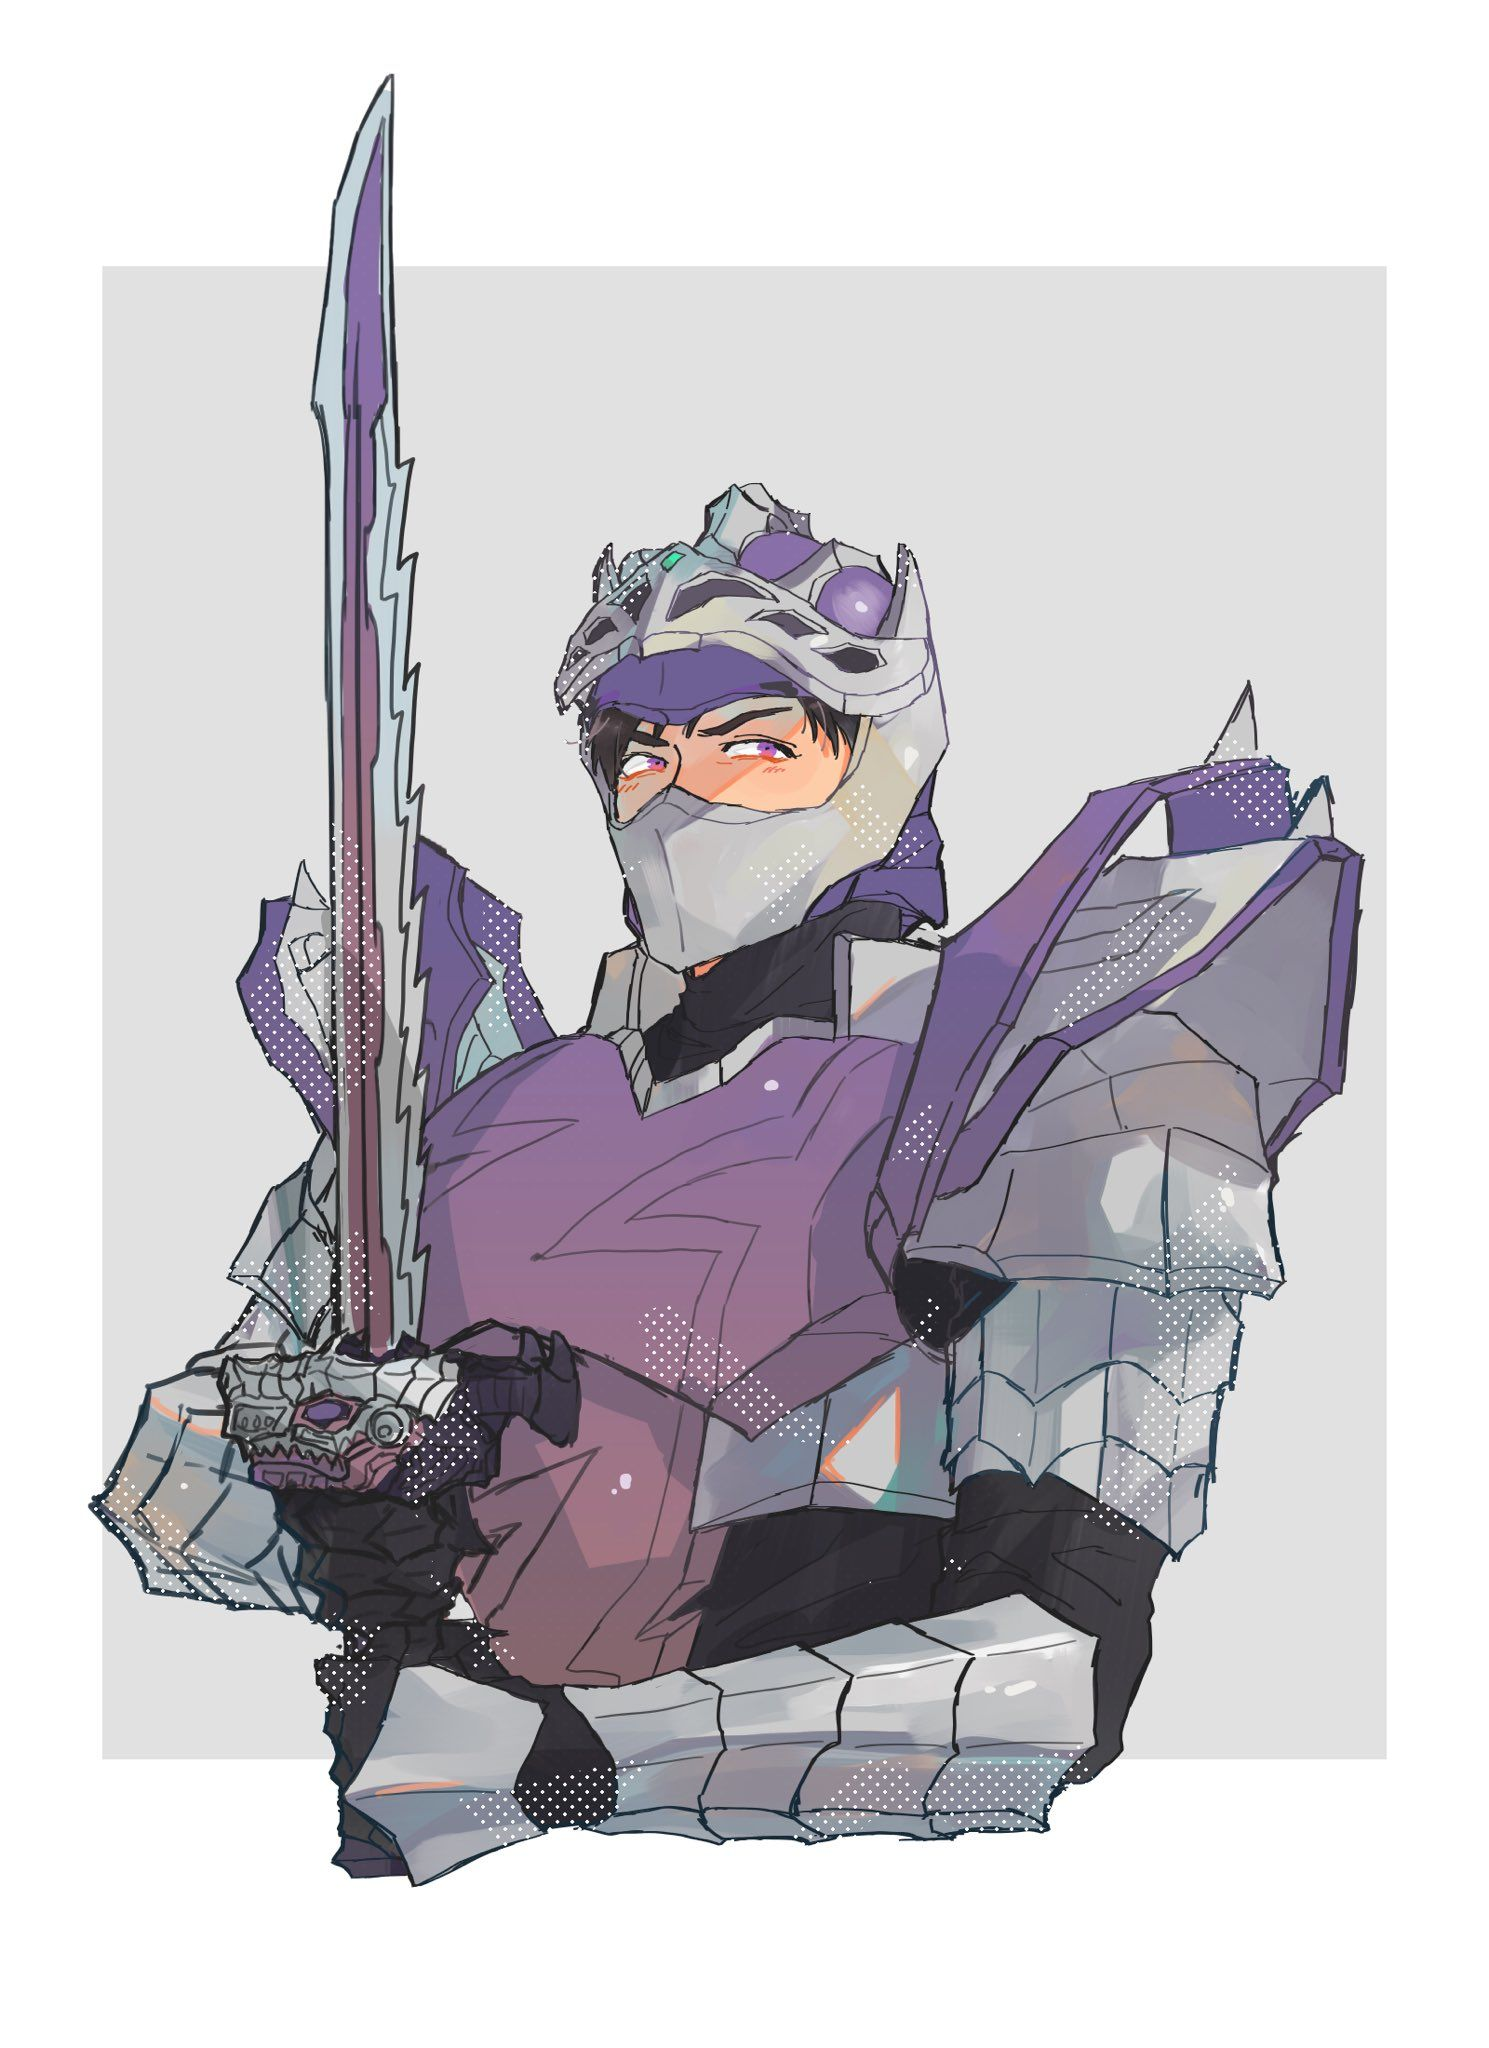 Pin by Taufiq on Super Sentai Animation art, Anime